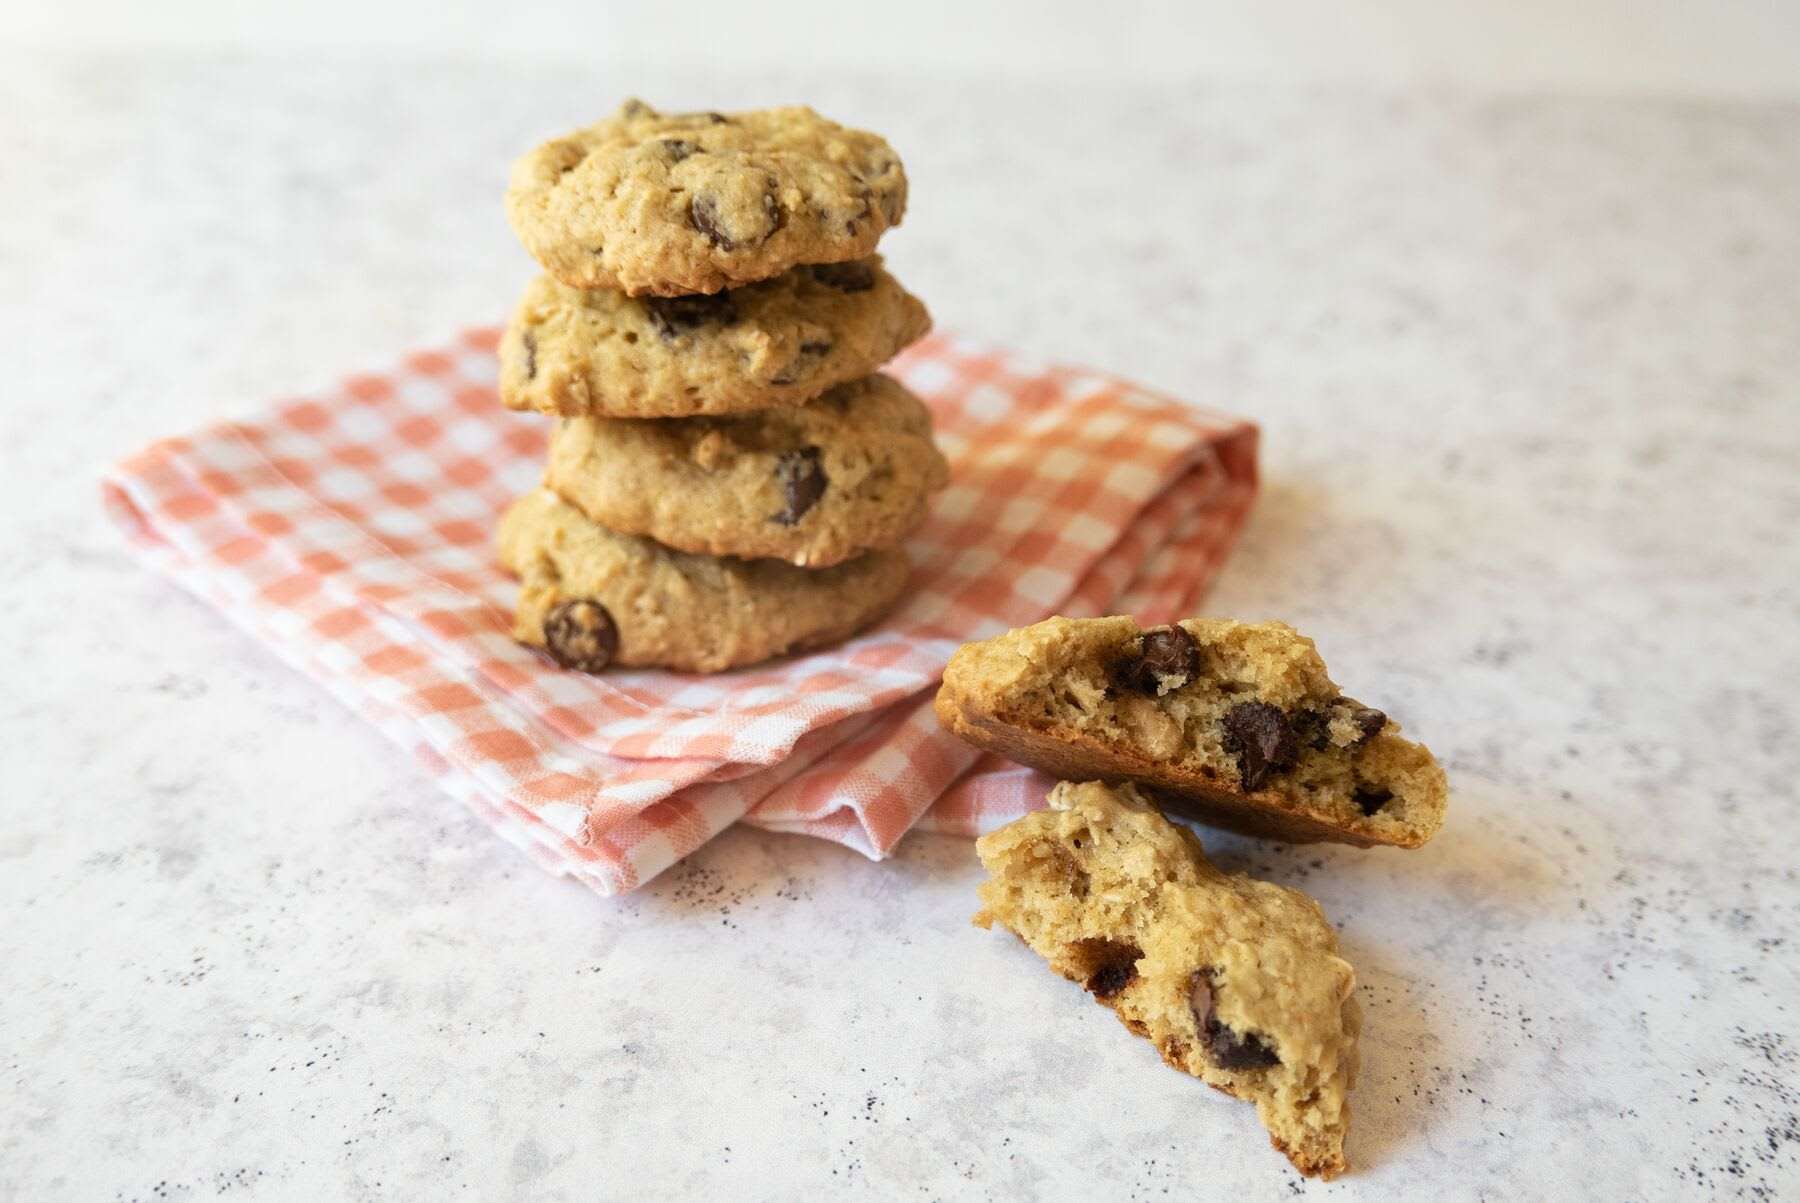 Photo of Chocolate chip & walnut cookies by WW